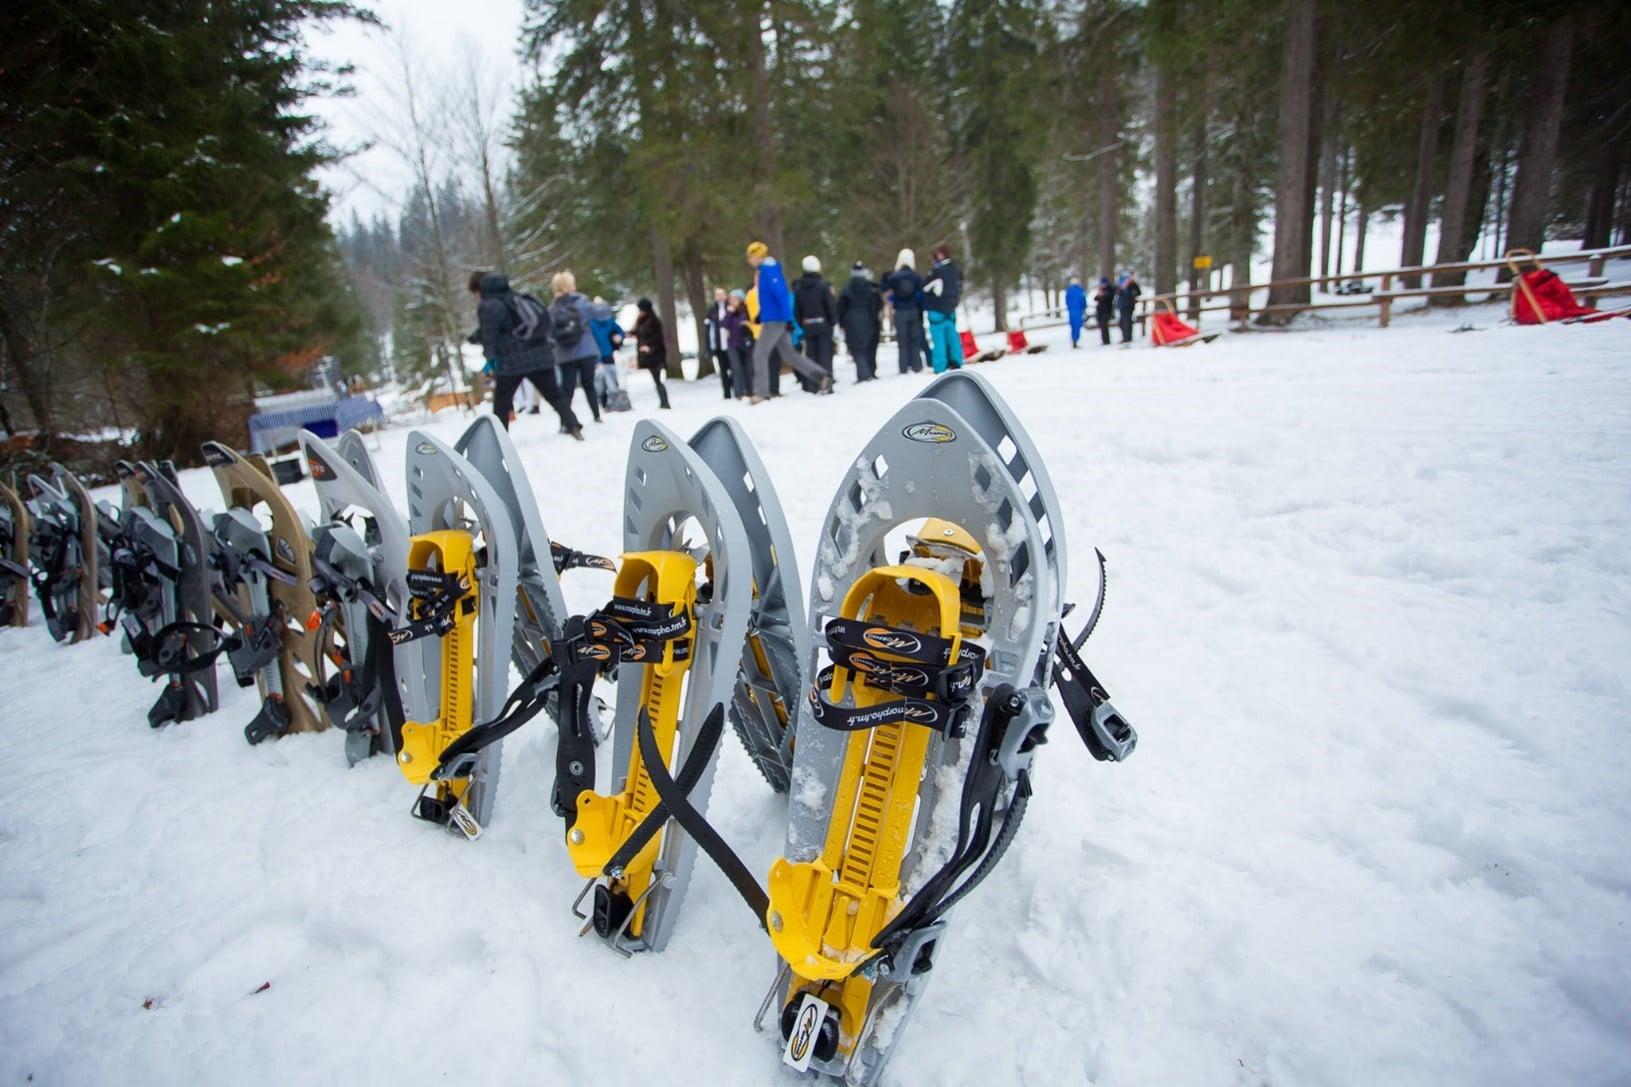 Snow shoeing Slovenia Incentives Intours